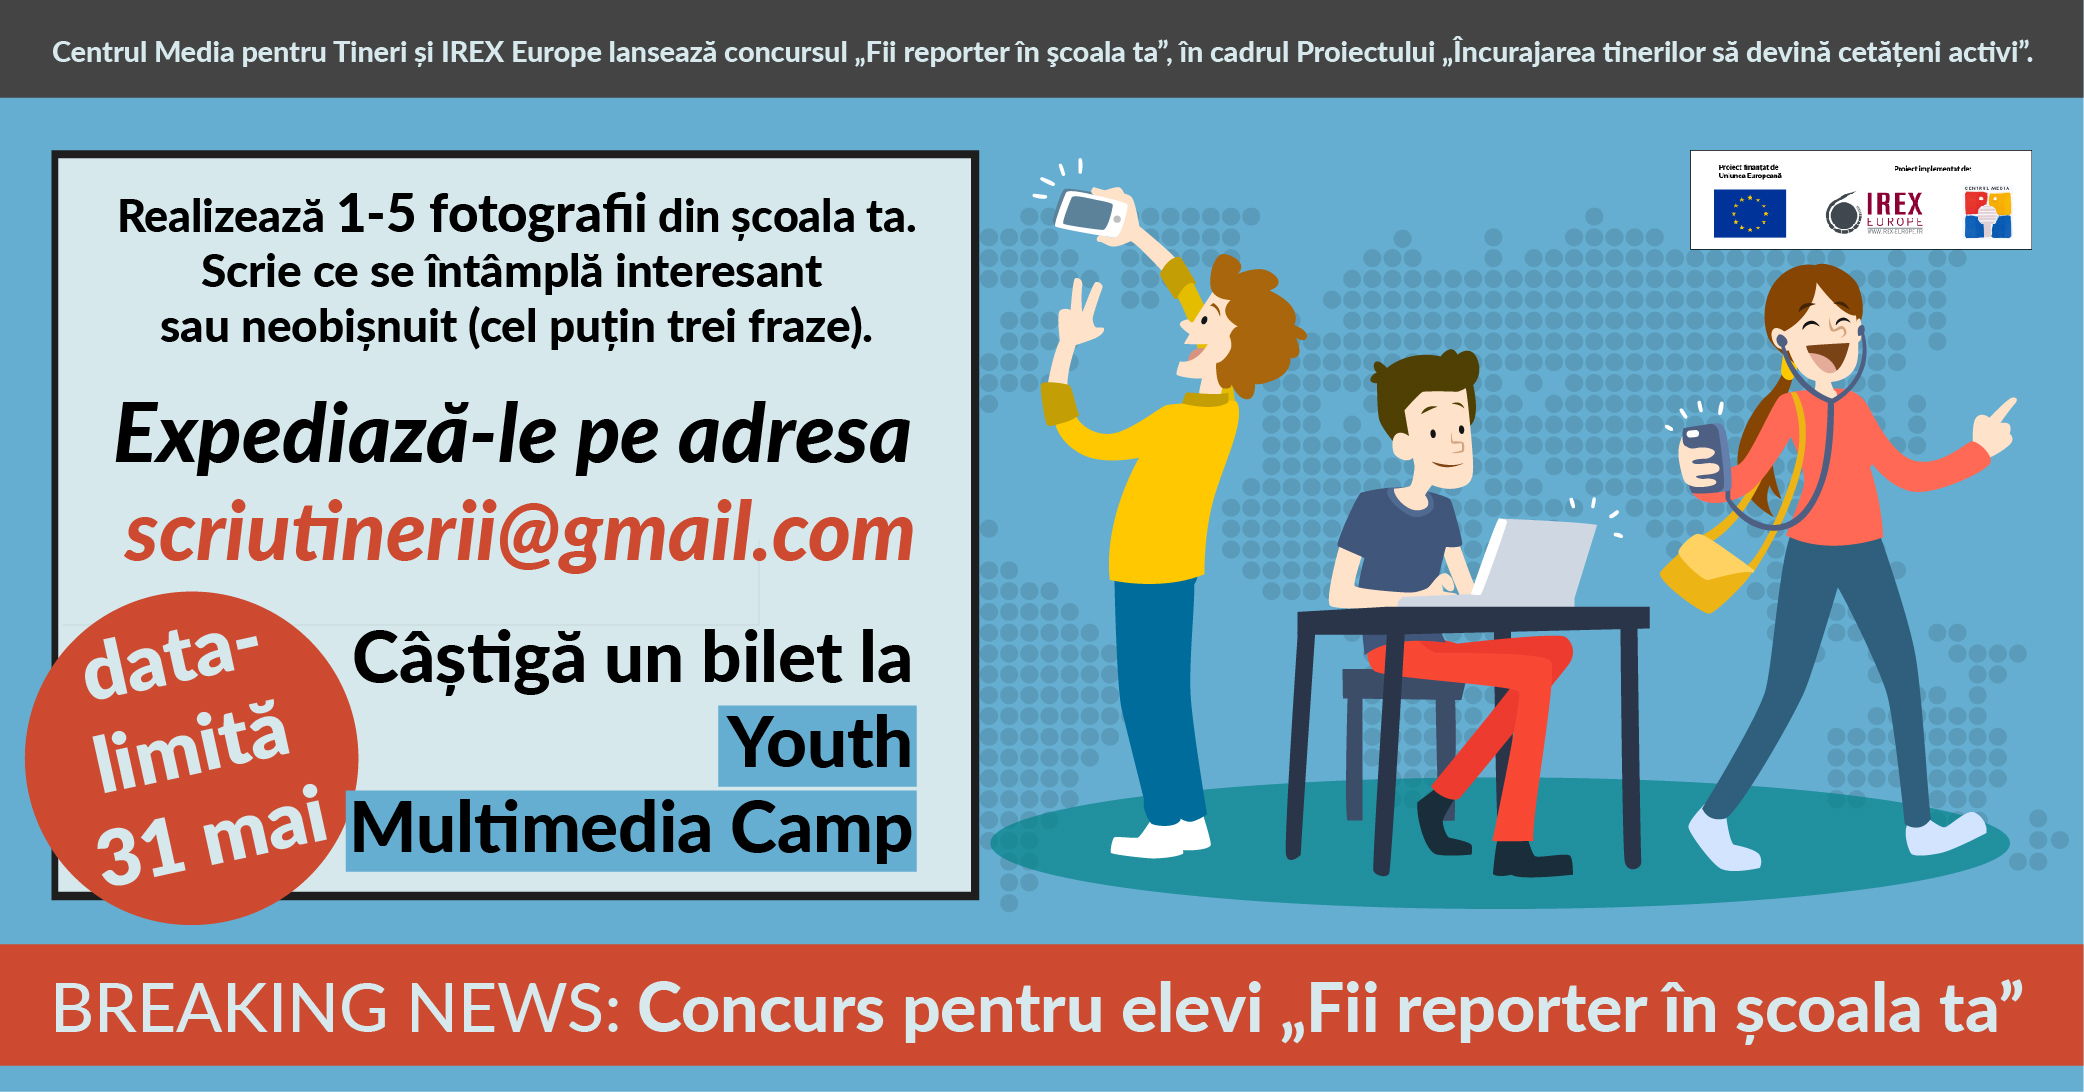 http://www.civic.md/concursuri/42188-concurs-pentru-elevi-fii-reporter-in-scoala-ta.html